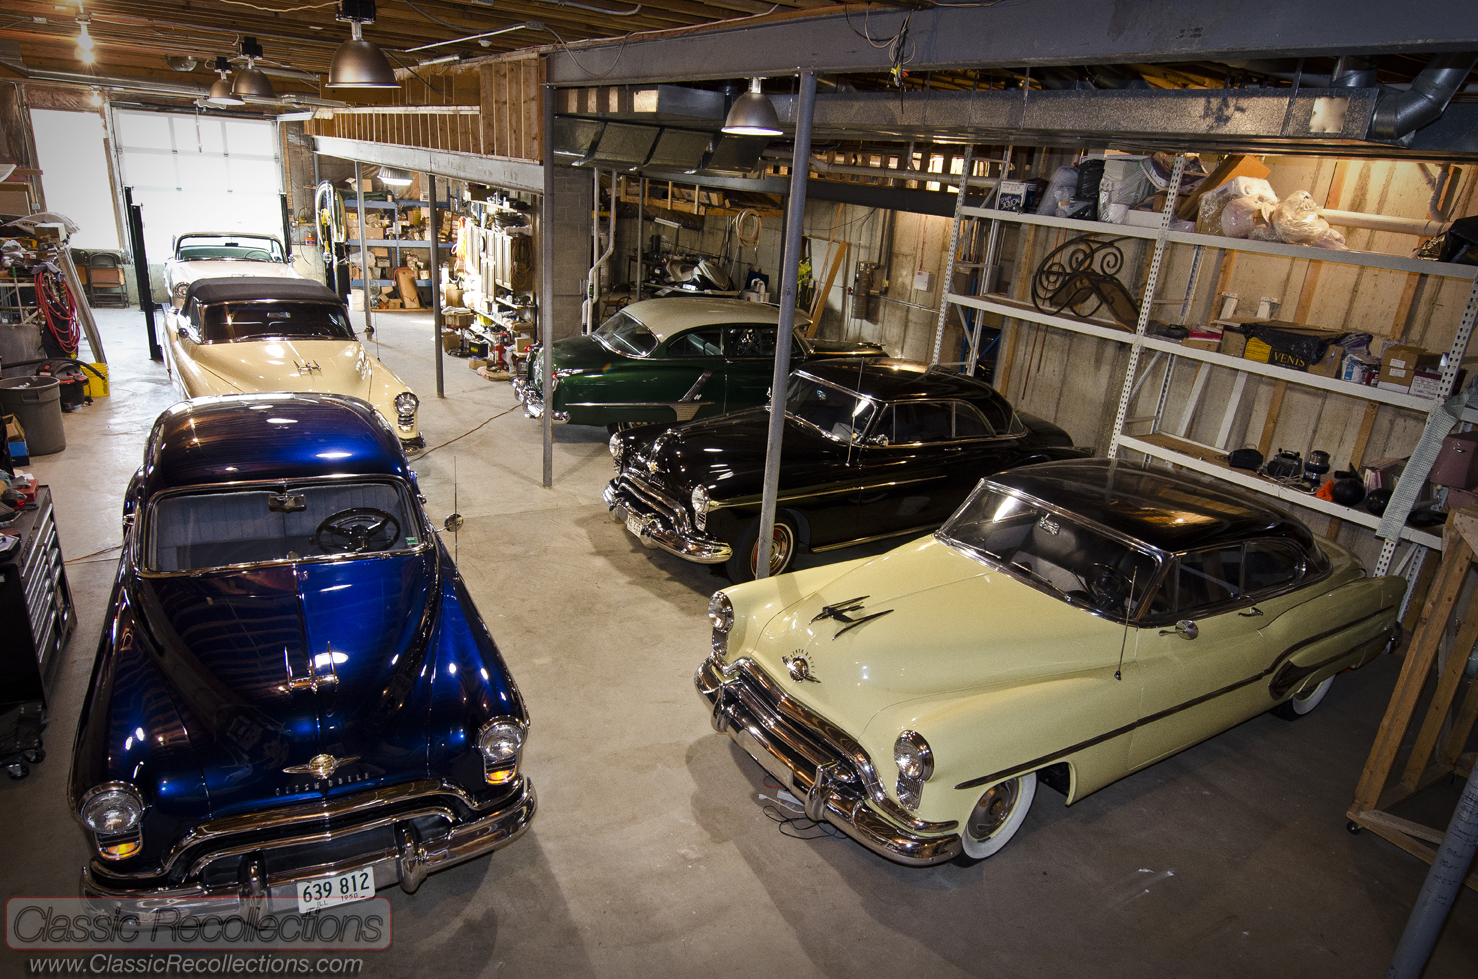 2 car garage man cave ideas - BangShift CHADMOUTH I Need Garage Space But Don t We